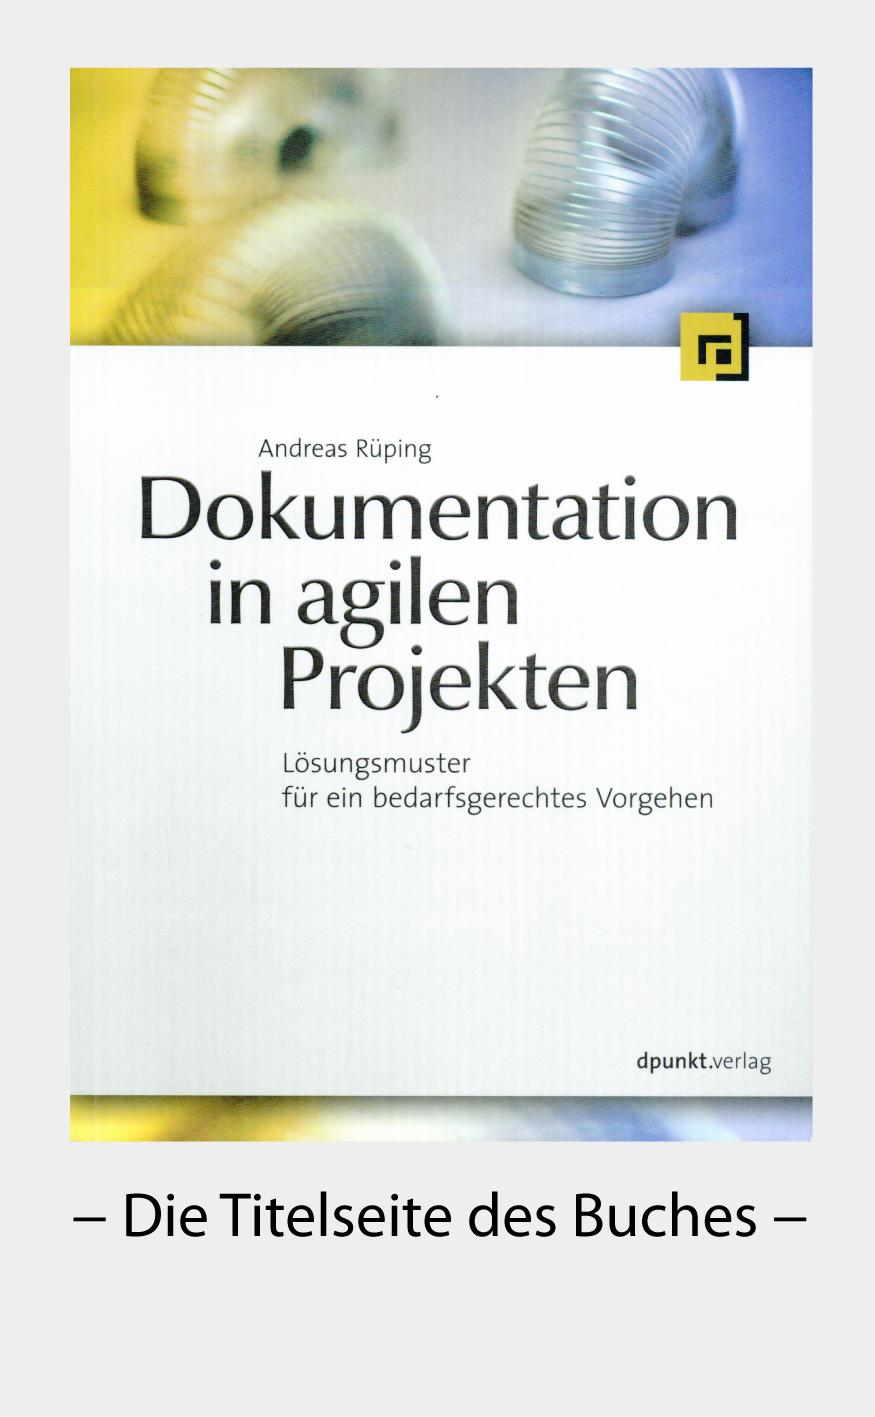 Titelseite Agile Dokumentation